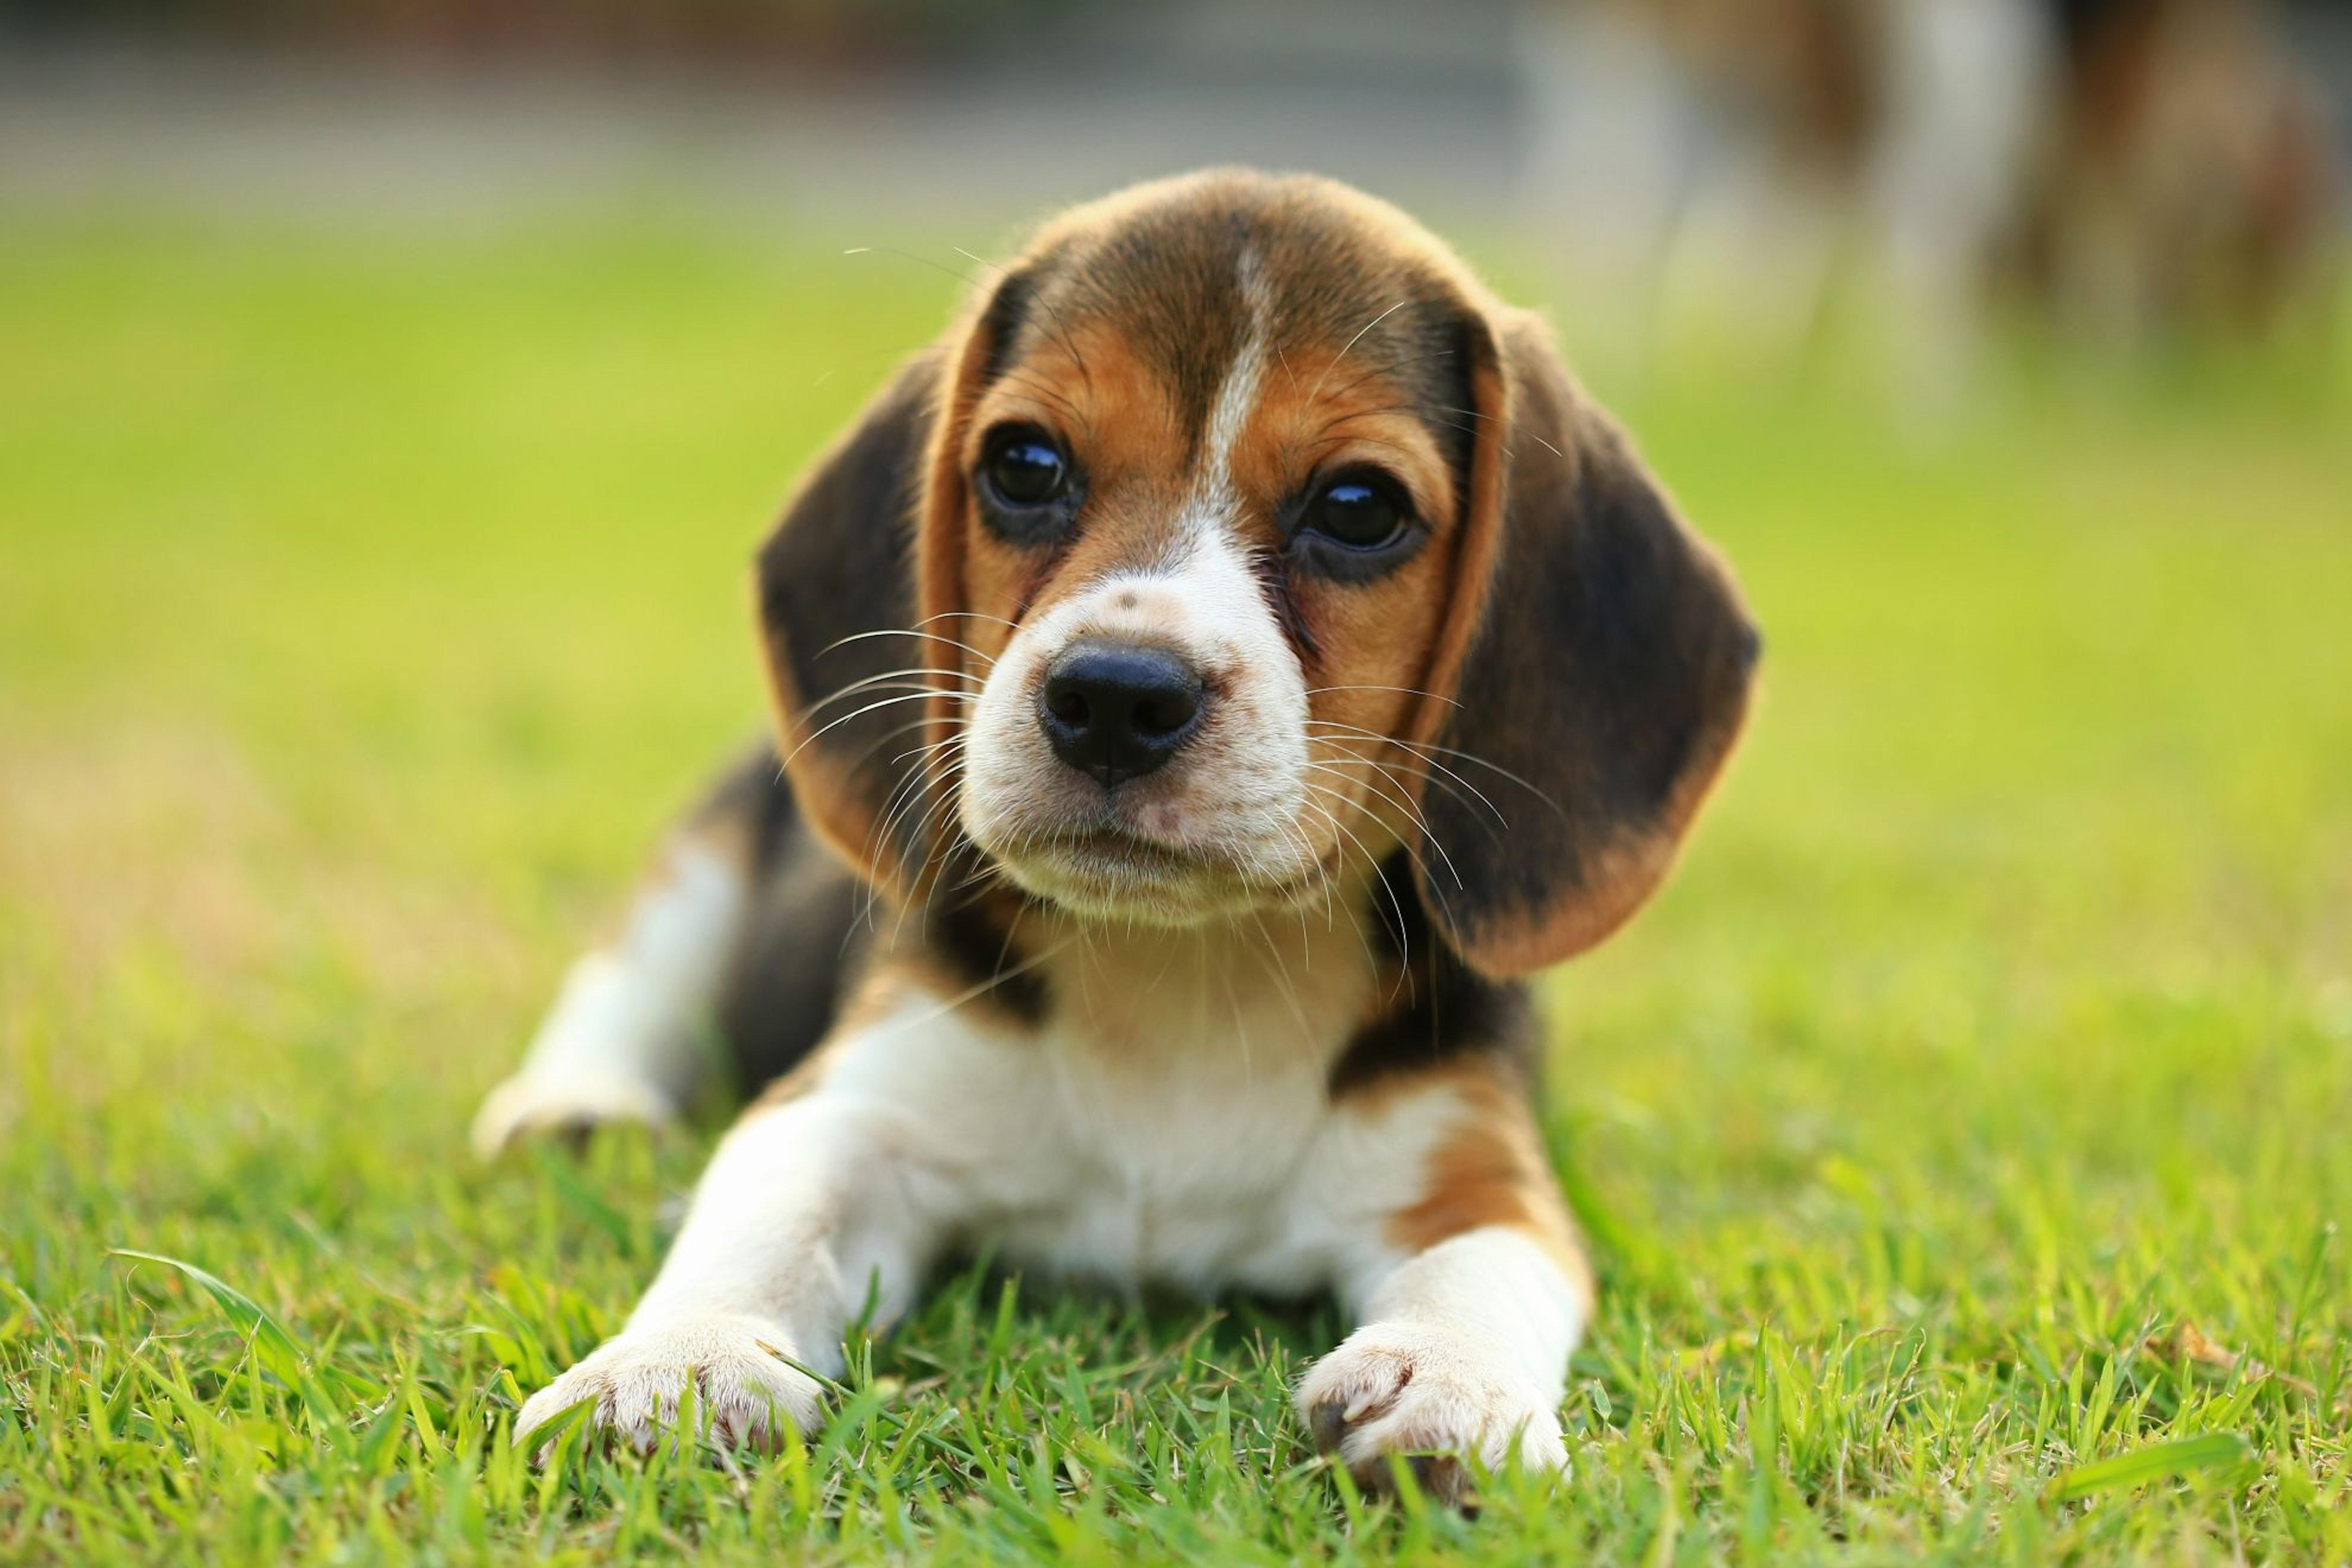 Weaning diarrhea in puppies